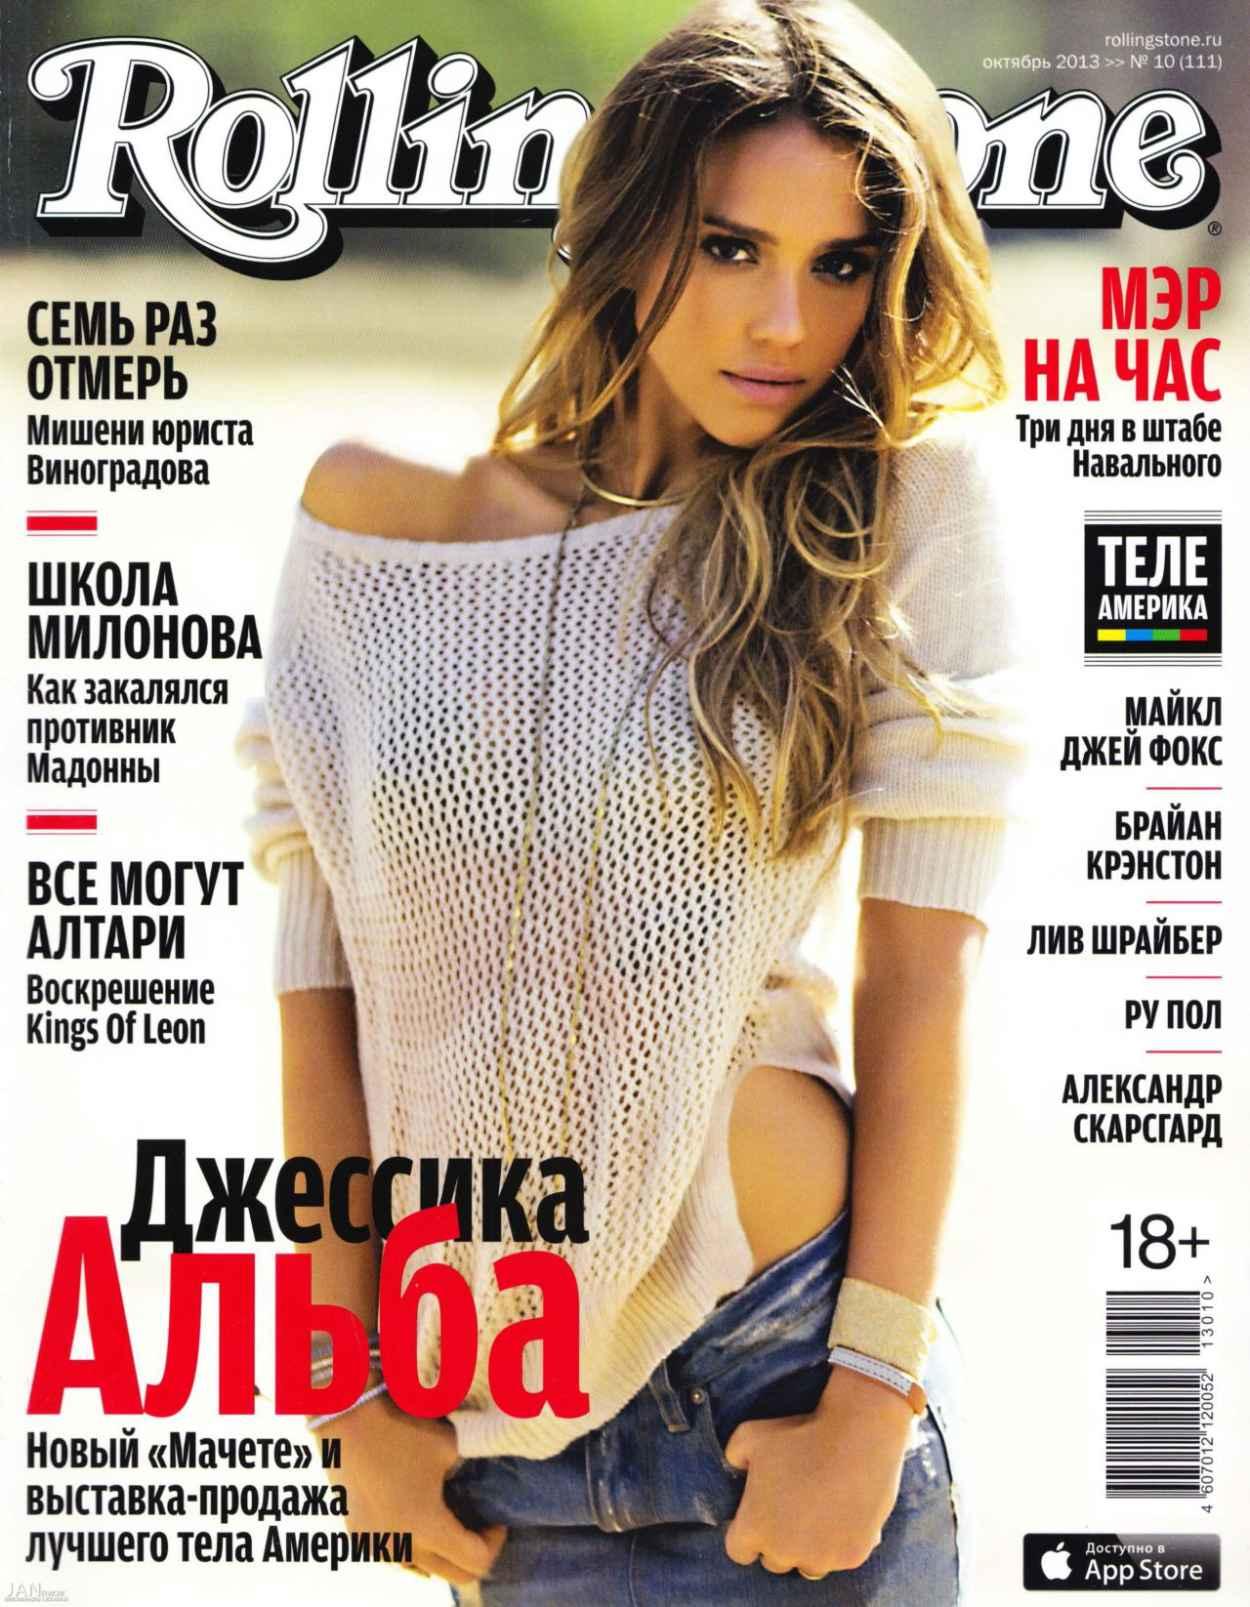 Jessica Alba in ROLLING STONE Magazine Russia - October 2015 Issue-1